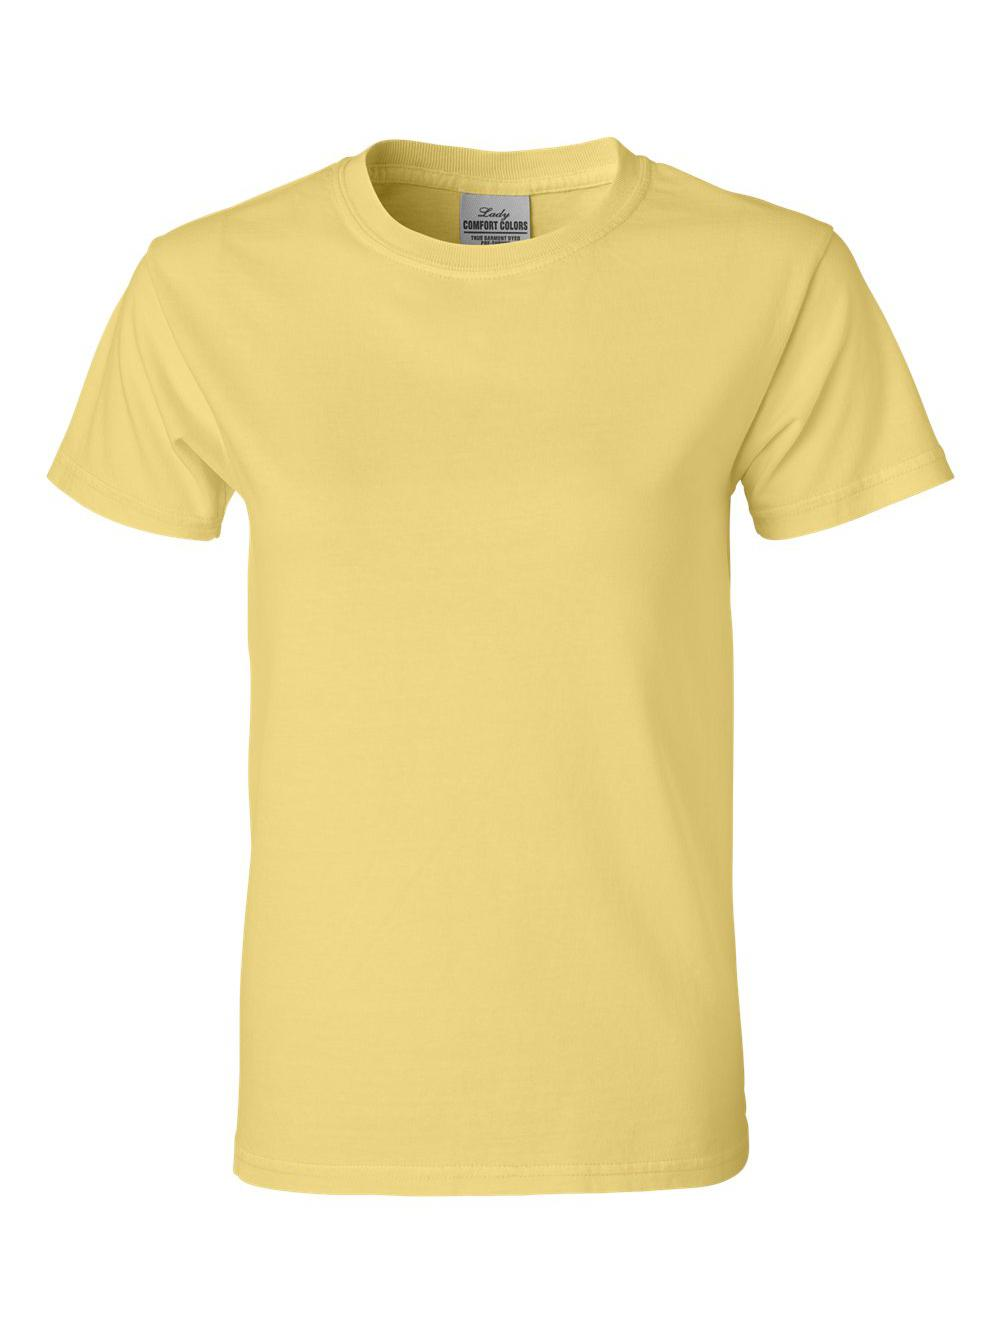 Comfort-Colors-Pigment-Dyed-Ringspun-Women-039-s-Short-Sleeve-T-Shirt-3333 thumbnail 6